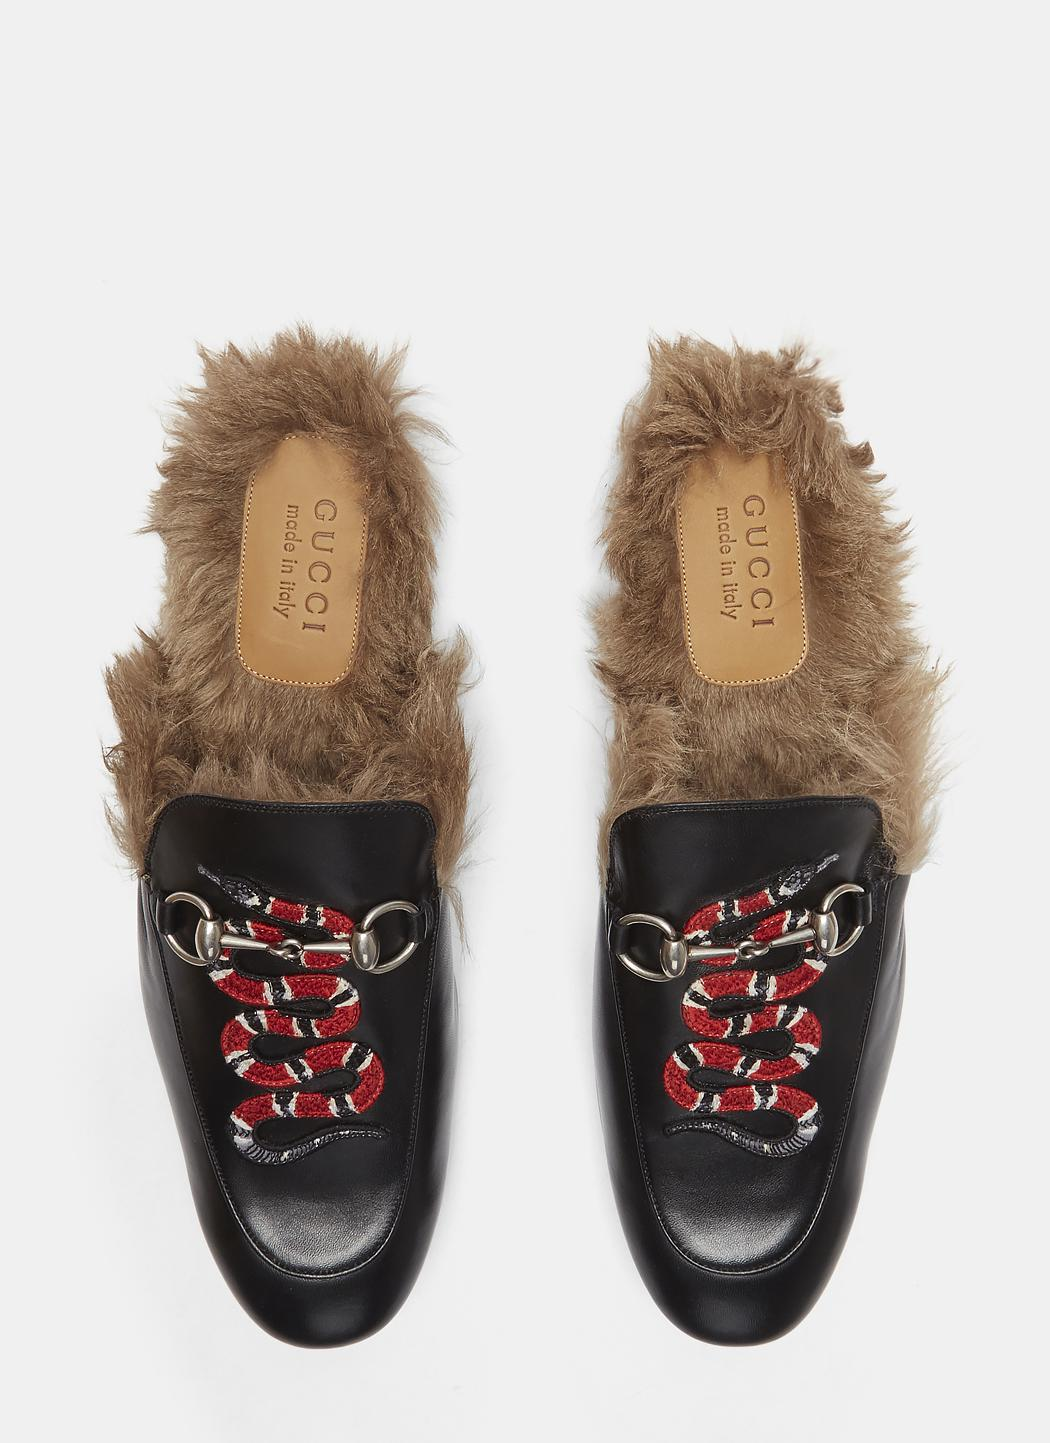 afe3c0e8369 Lyst - Gucci Princetown Kingsnake Slipper Shoes In Black in Black ...